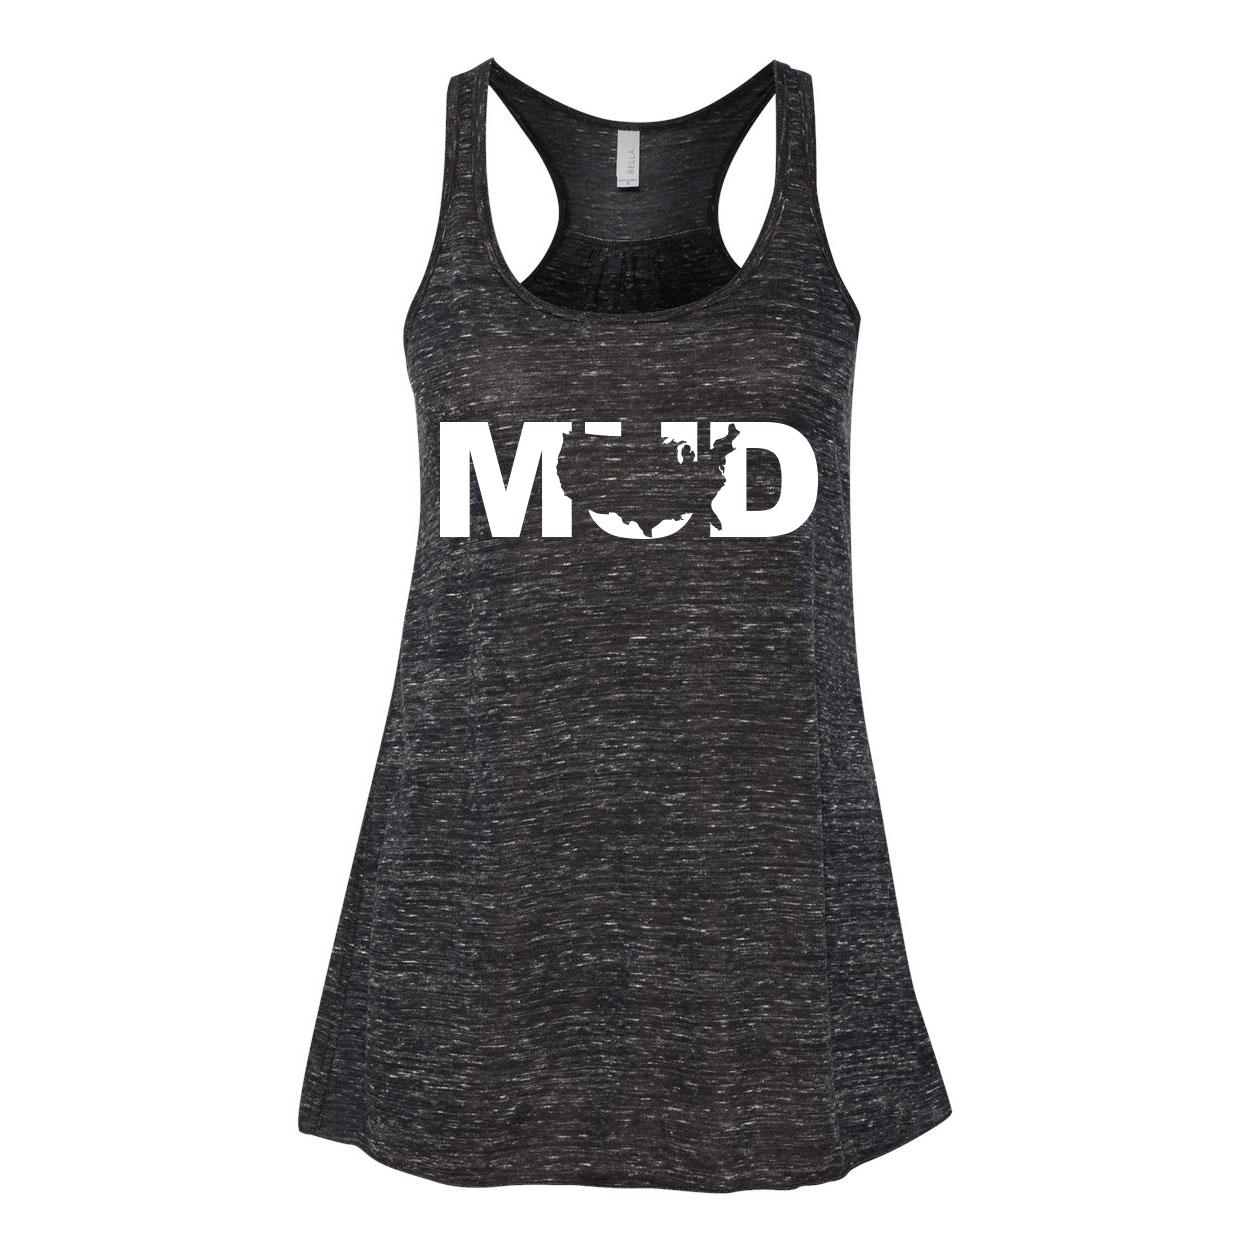 Mud United States Classic Women's Flowy Racerback Tank Top Black Marble (White Logo)